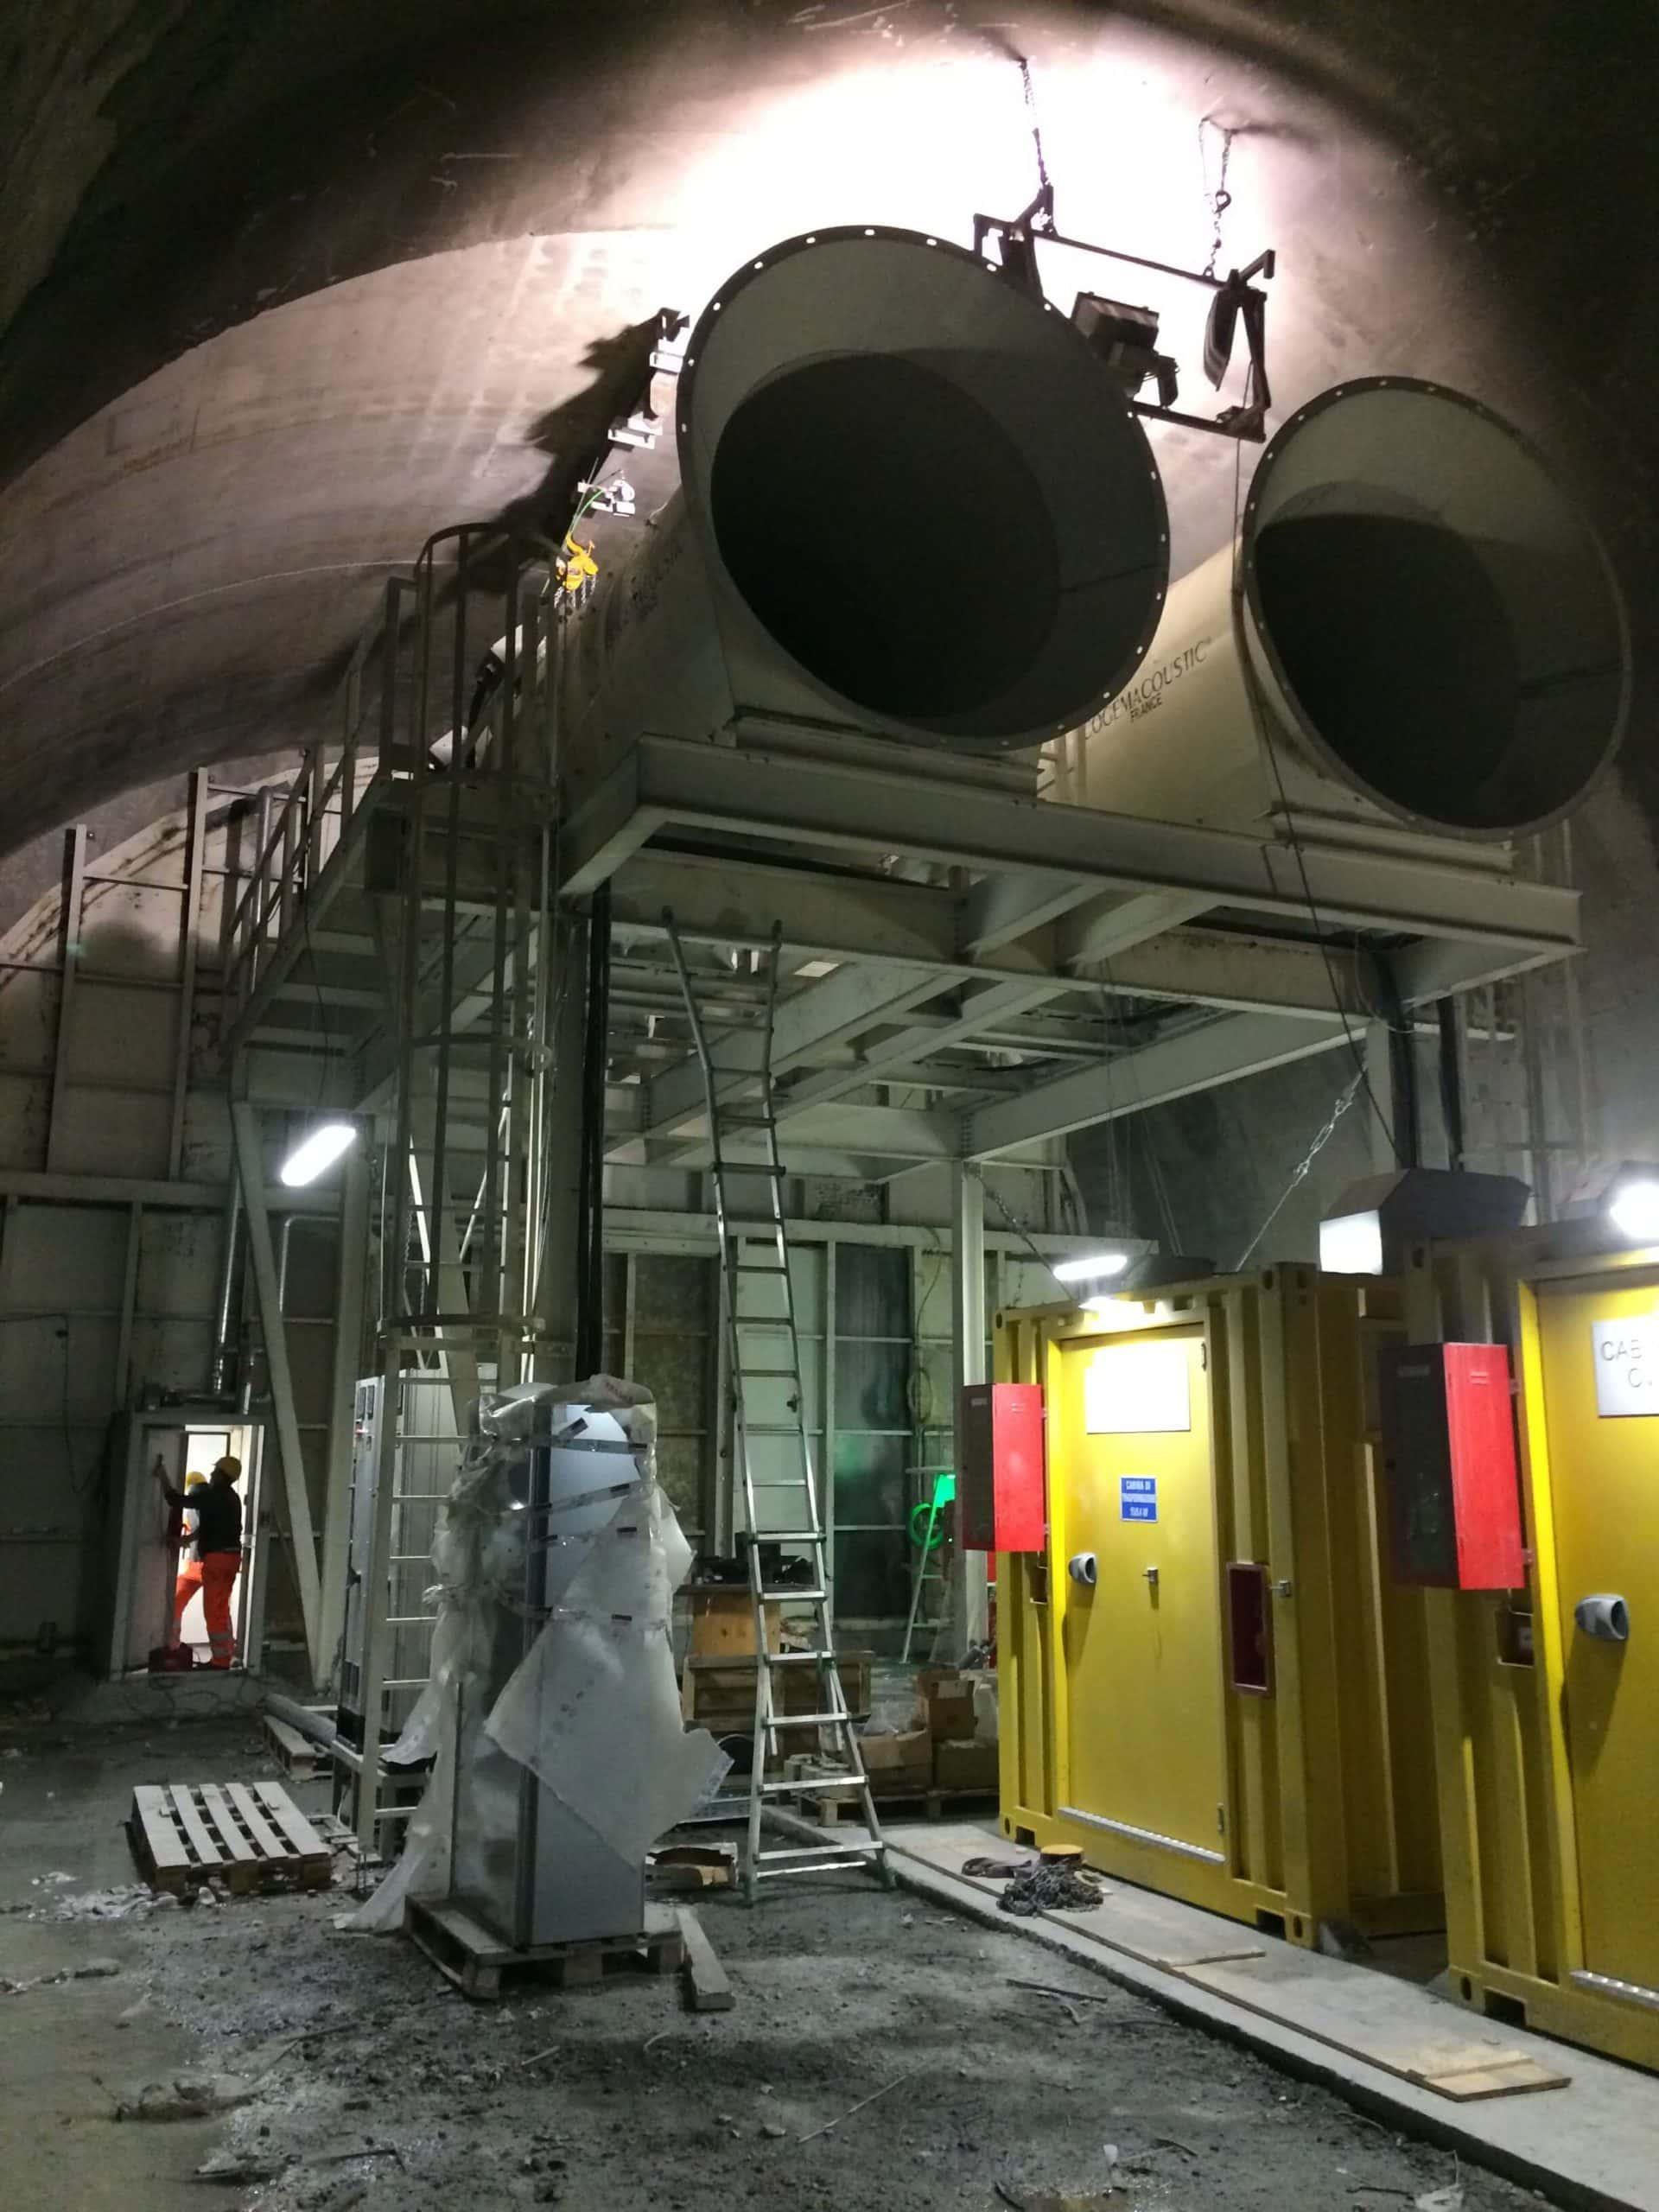 Tunnel Val-Lemme